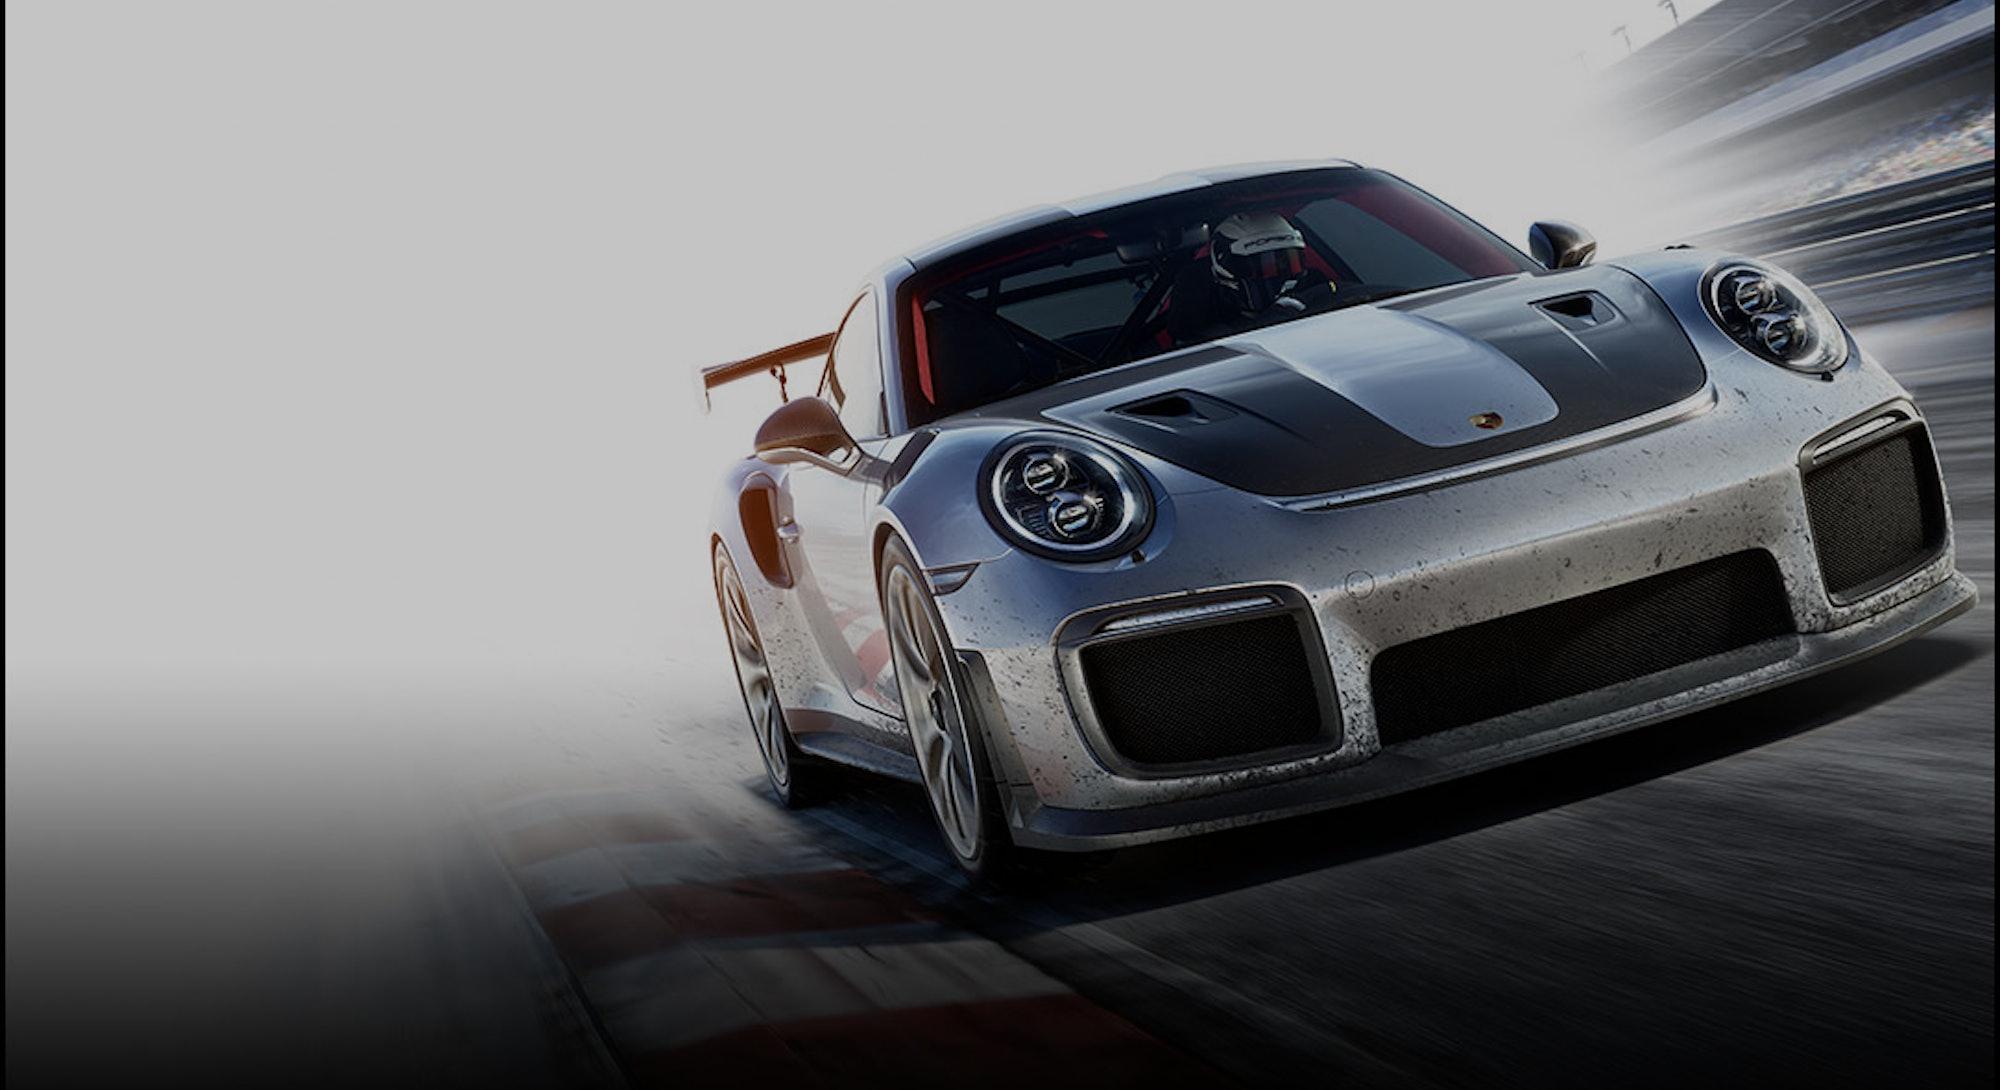 promo art from Forza Motorsport 7